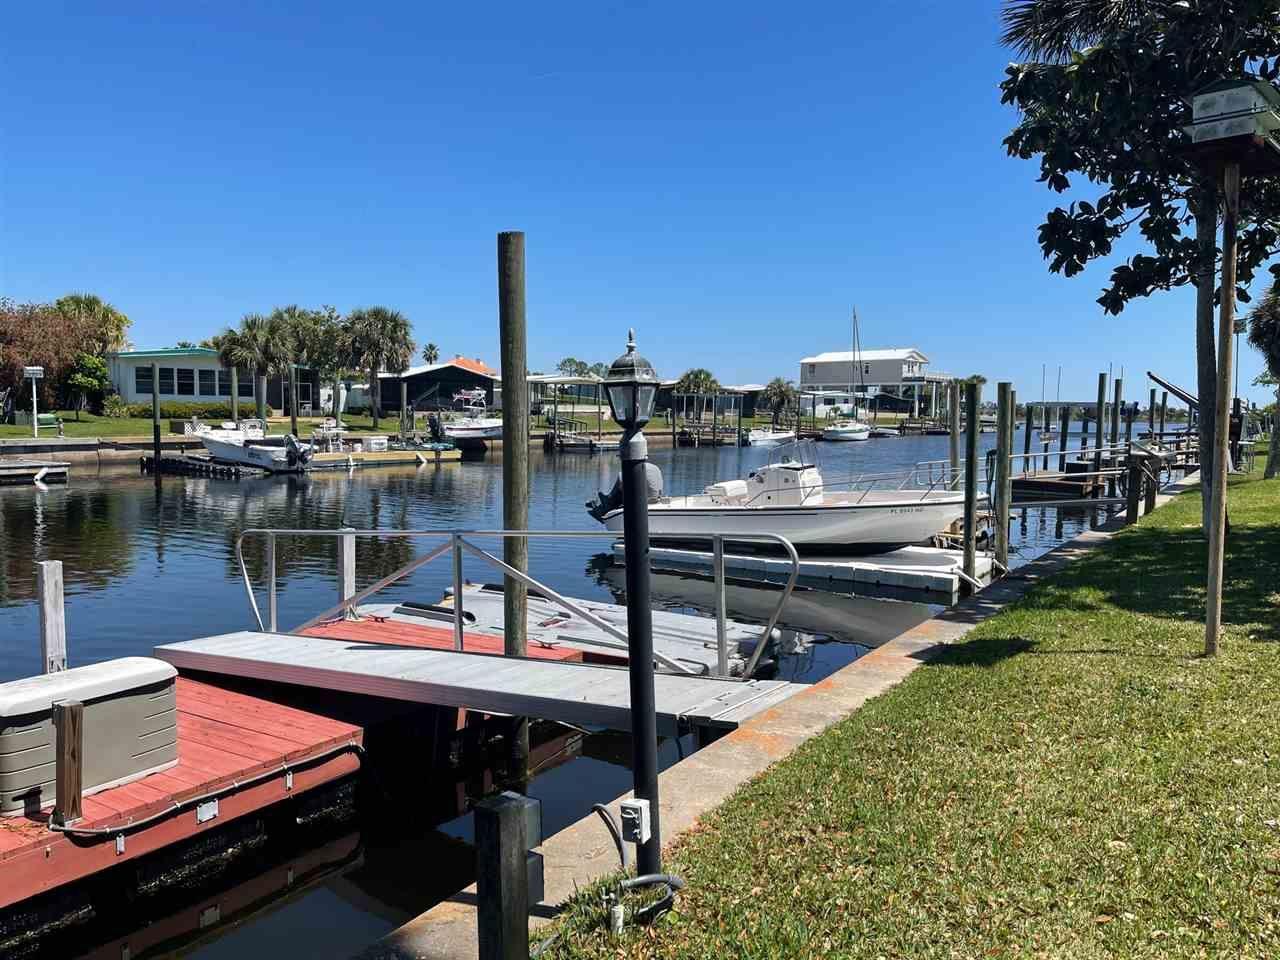 54 Janet Drive, Crawfordville, FL 32327 - MLS#: 330953